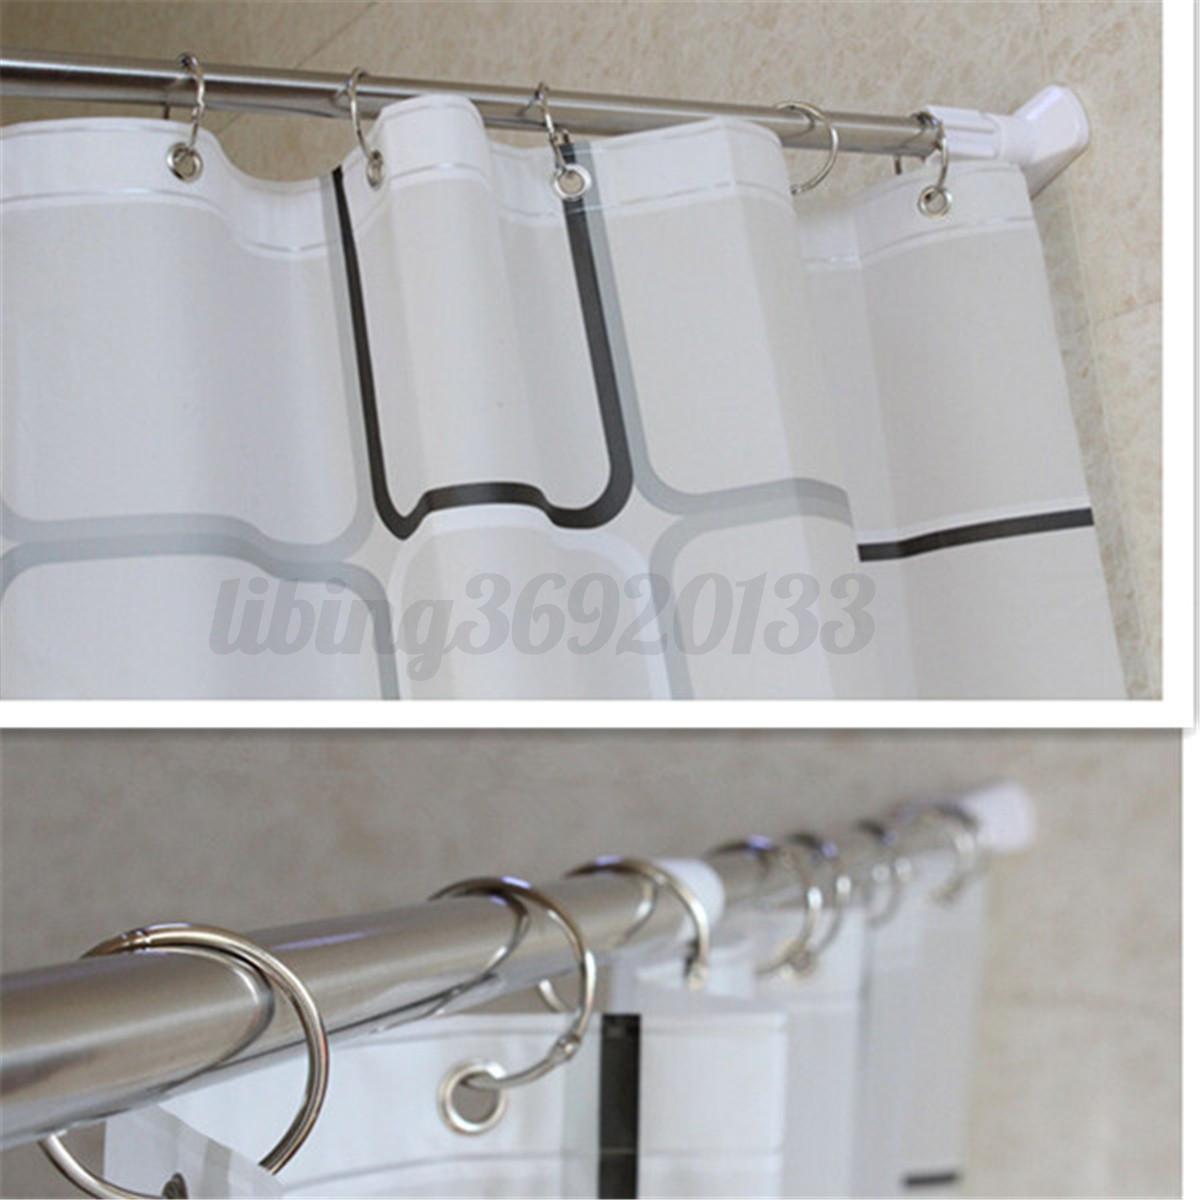 28 48 stainless adjustable tension door room bathroom shower curtain pole rod. Black Bedroom Furniture Sets. Home Design Ideas